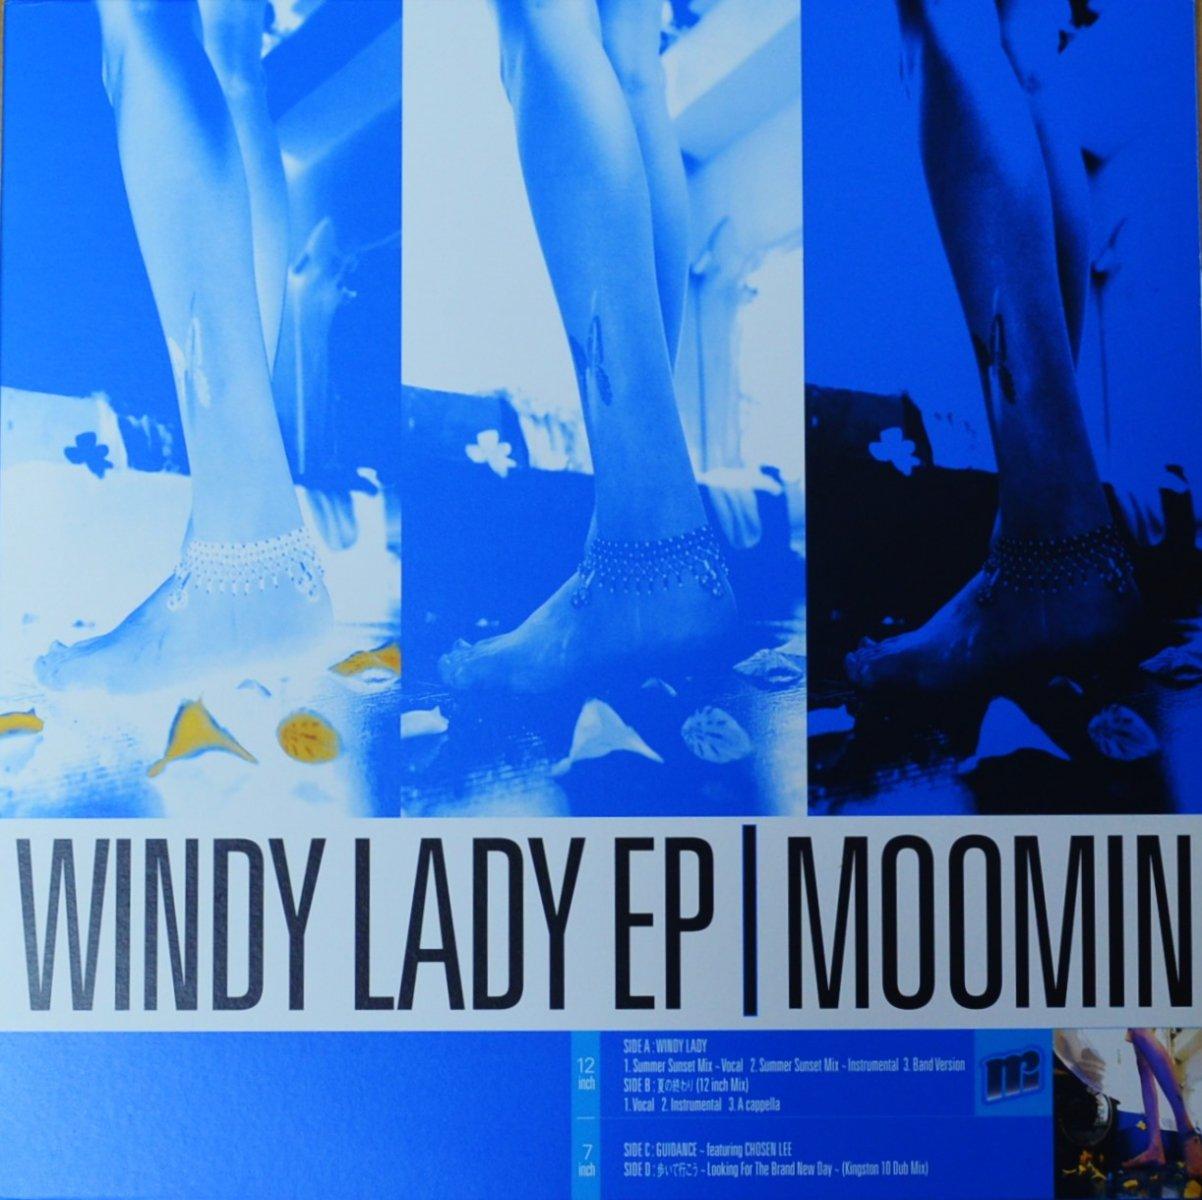 MOOMIN / WINDY LADY EP / 夏の終わり (PROD BY DEV LARGE) / GUIDANCE / 歩いて行こう (12